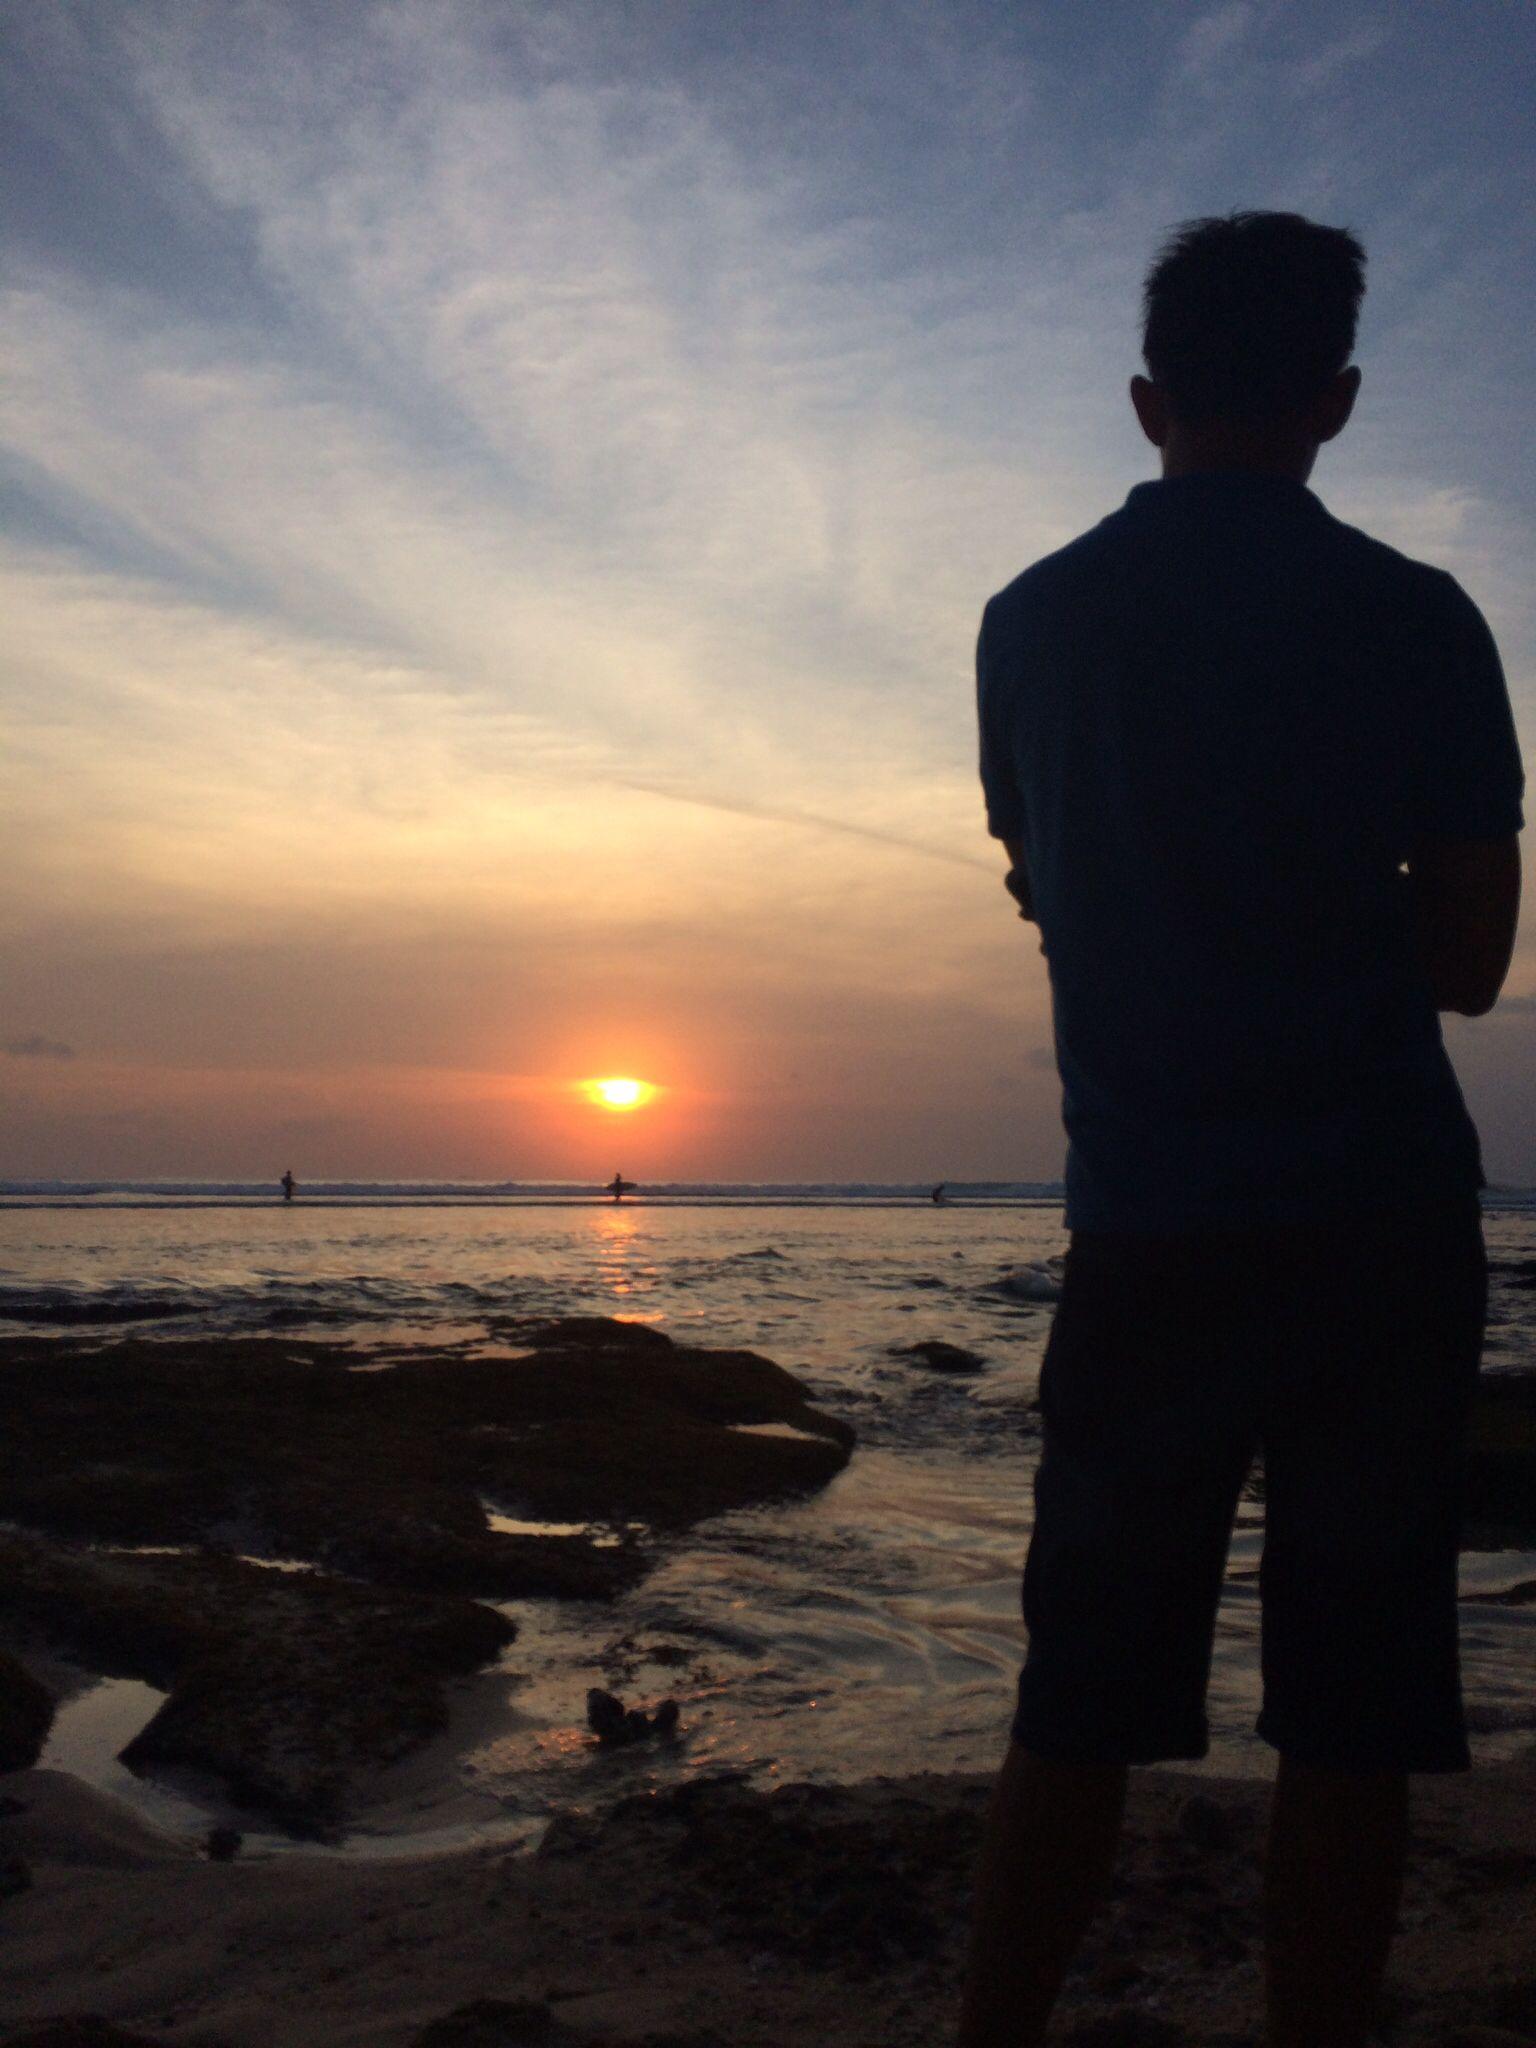 Enjoying the sunset moment Silhouette photography, Boy